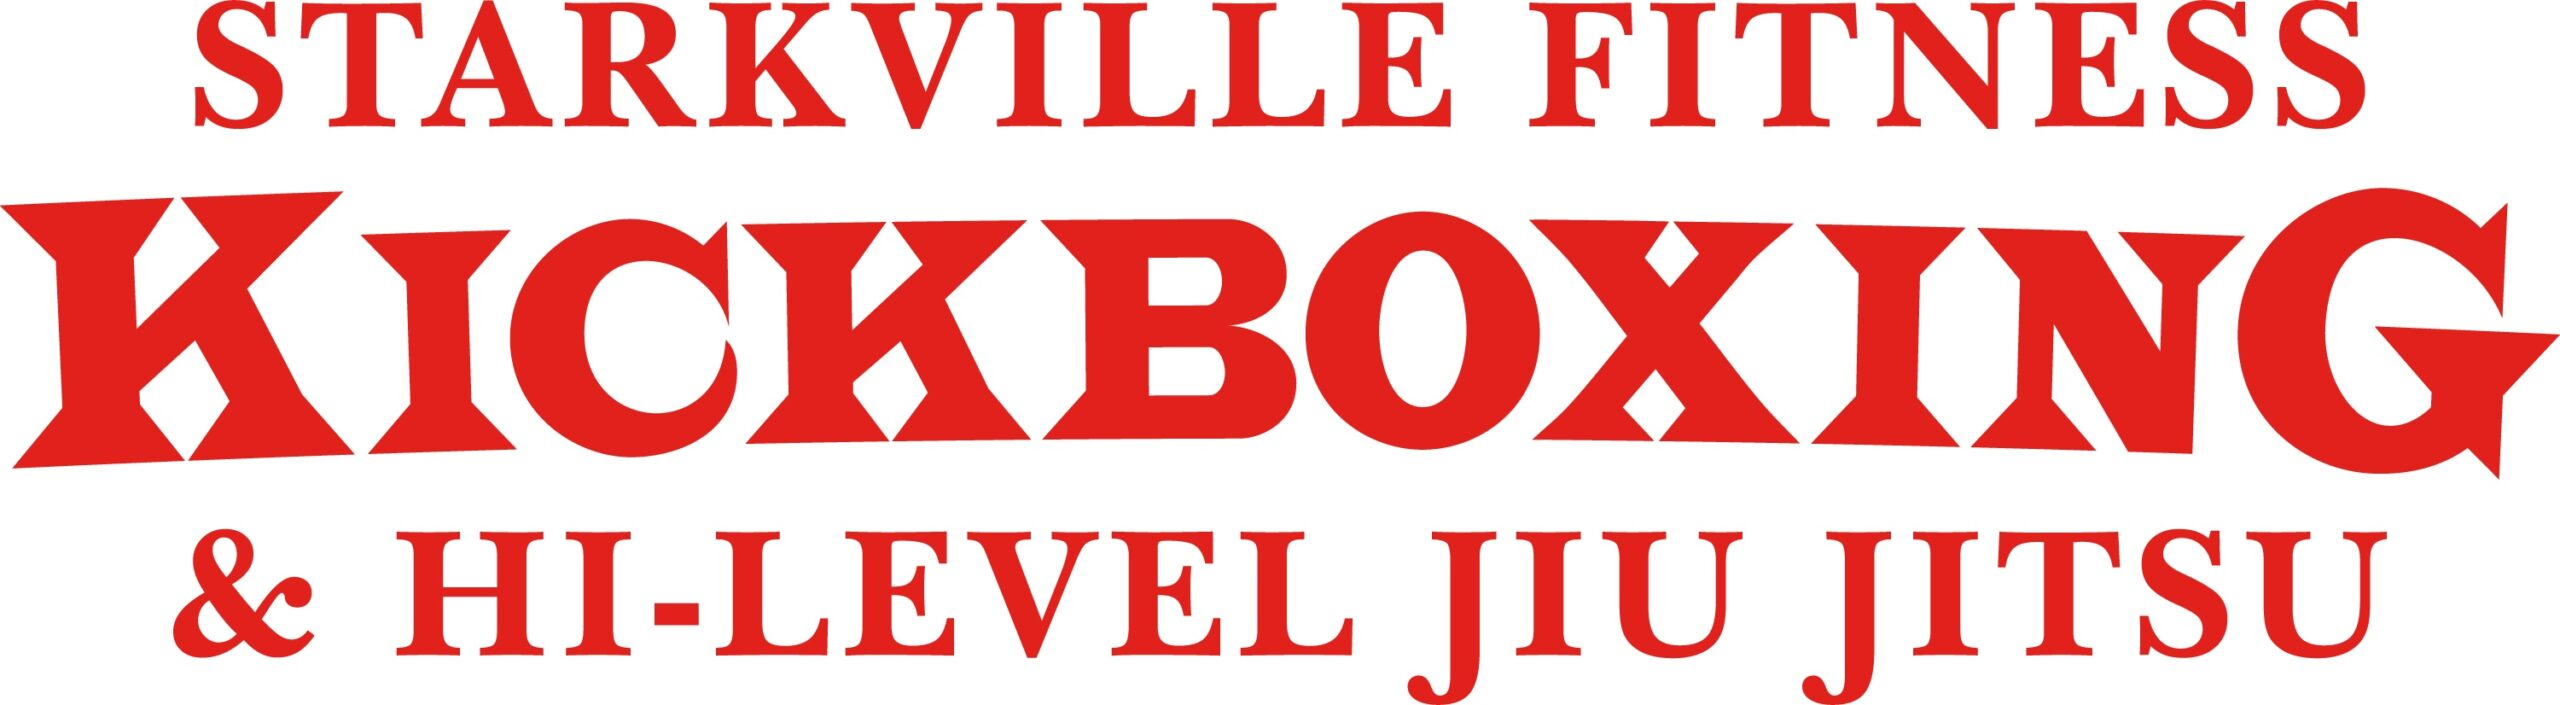 Starkville Fitness Kickboxing